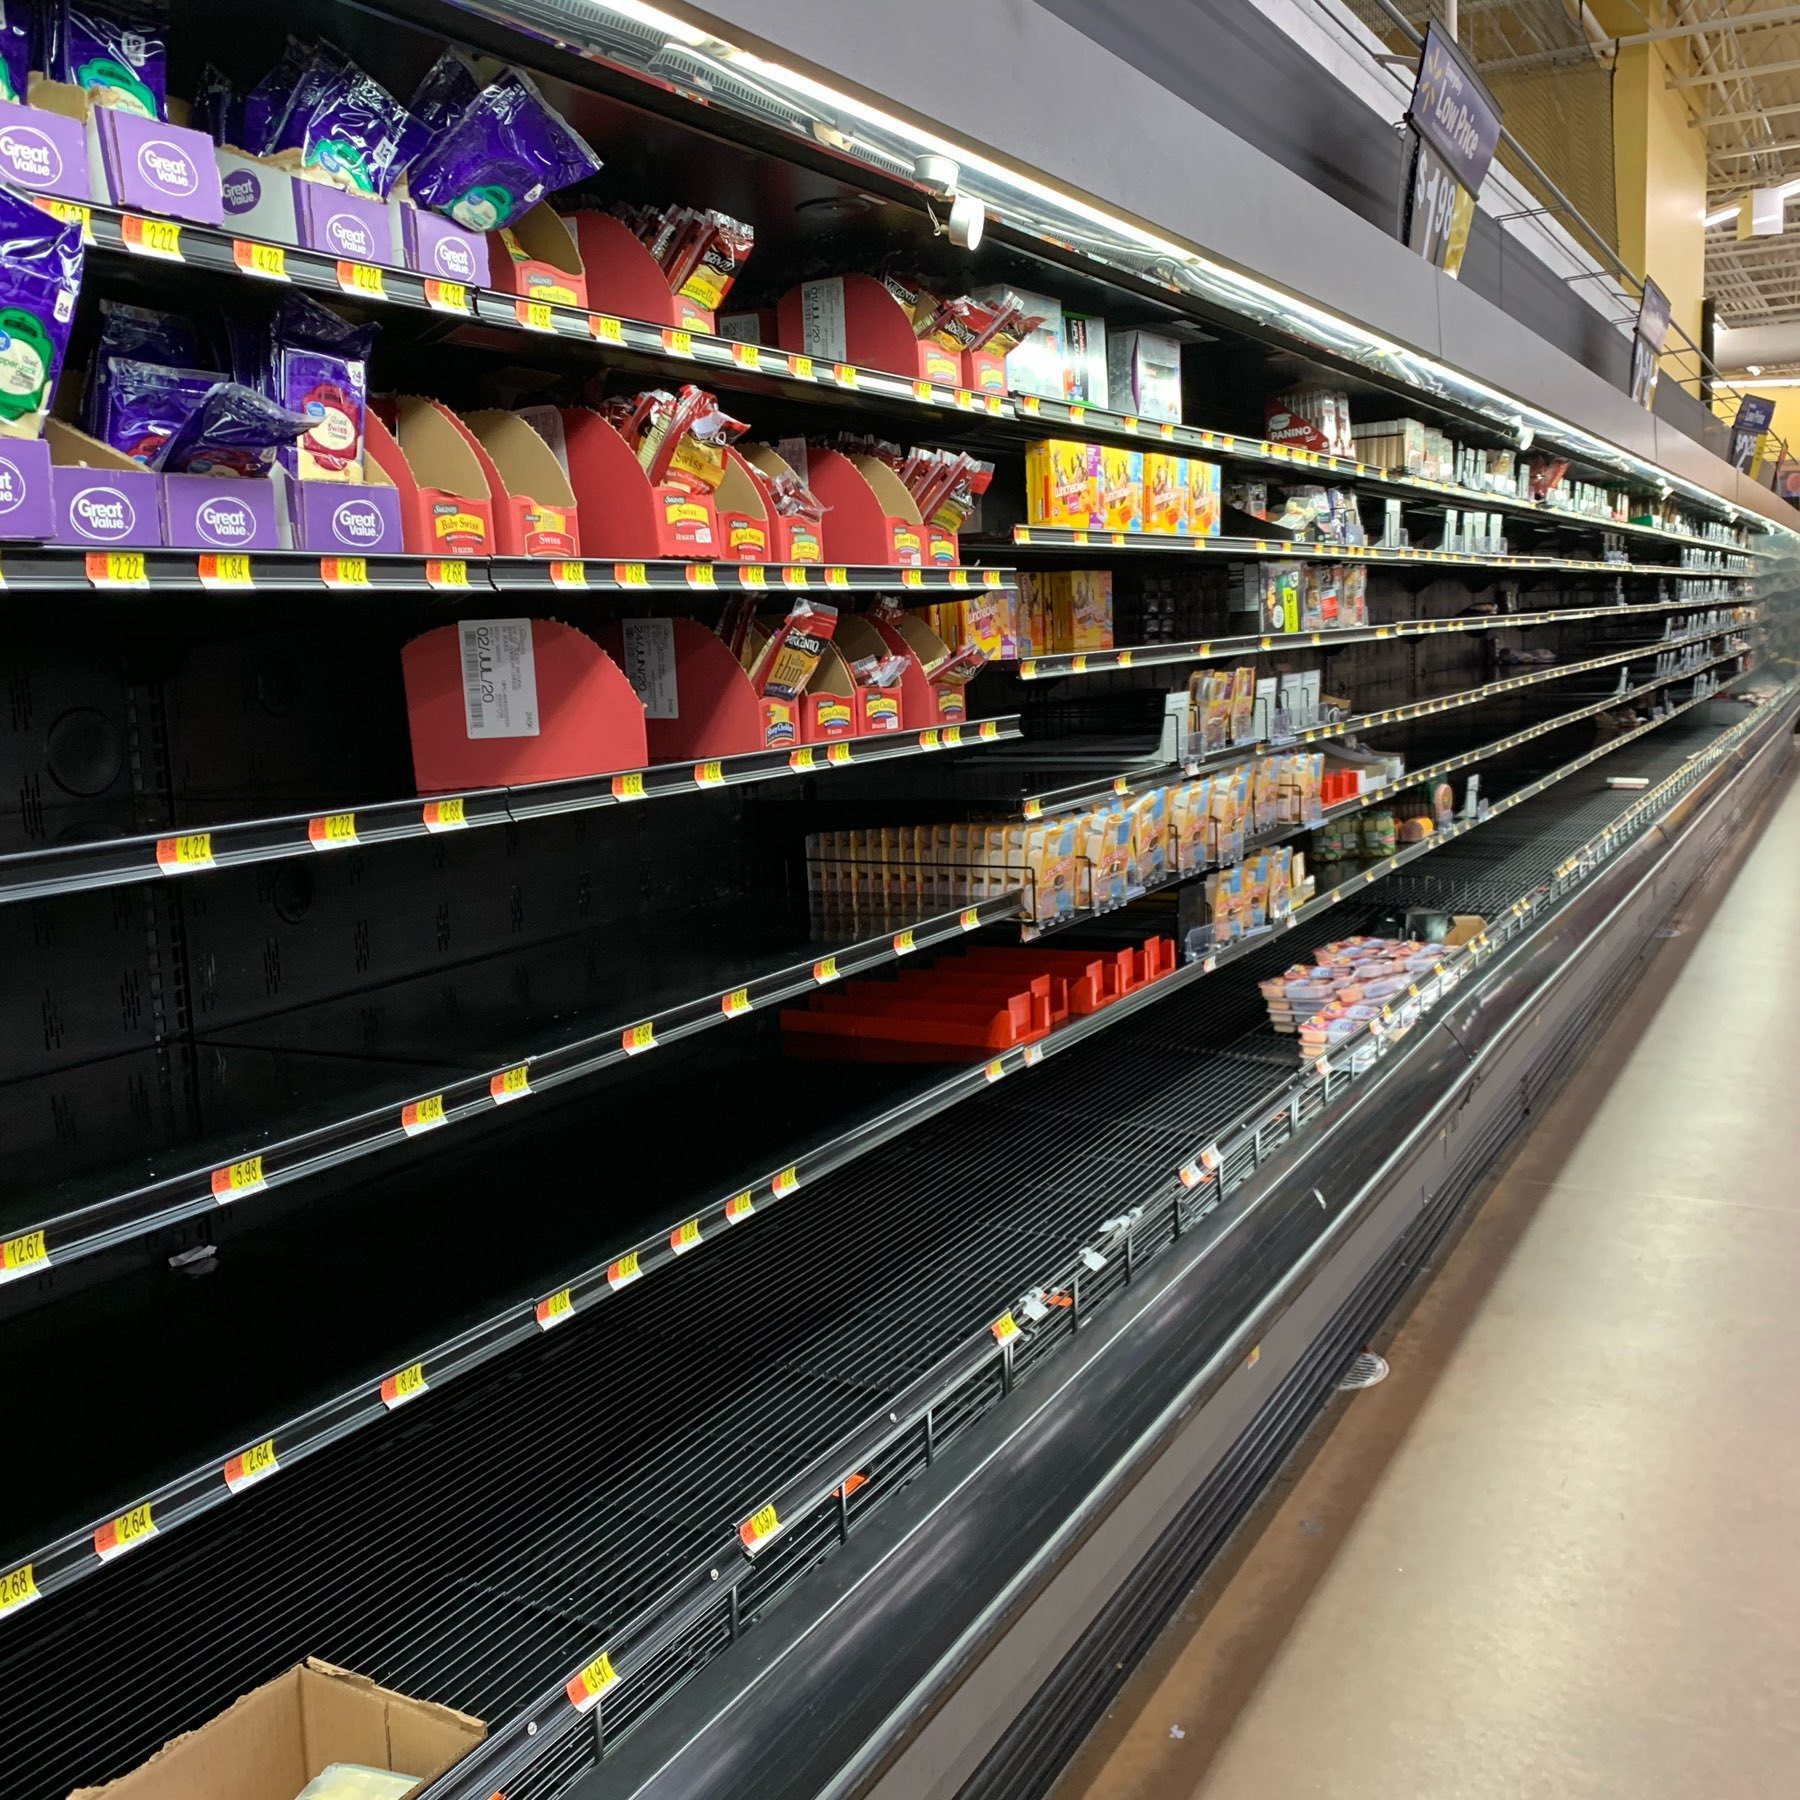 Empty dairy shelves